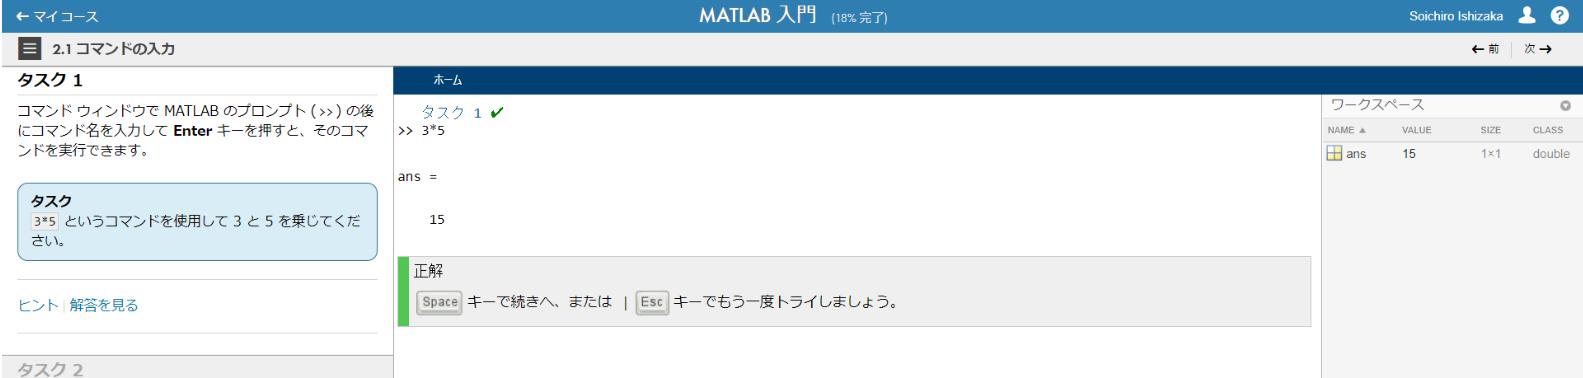 MATLAB入門 - 3*5